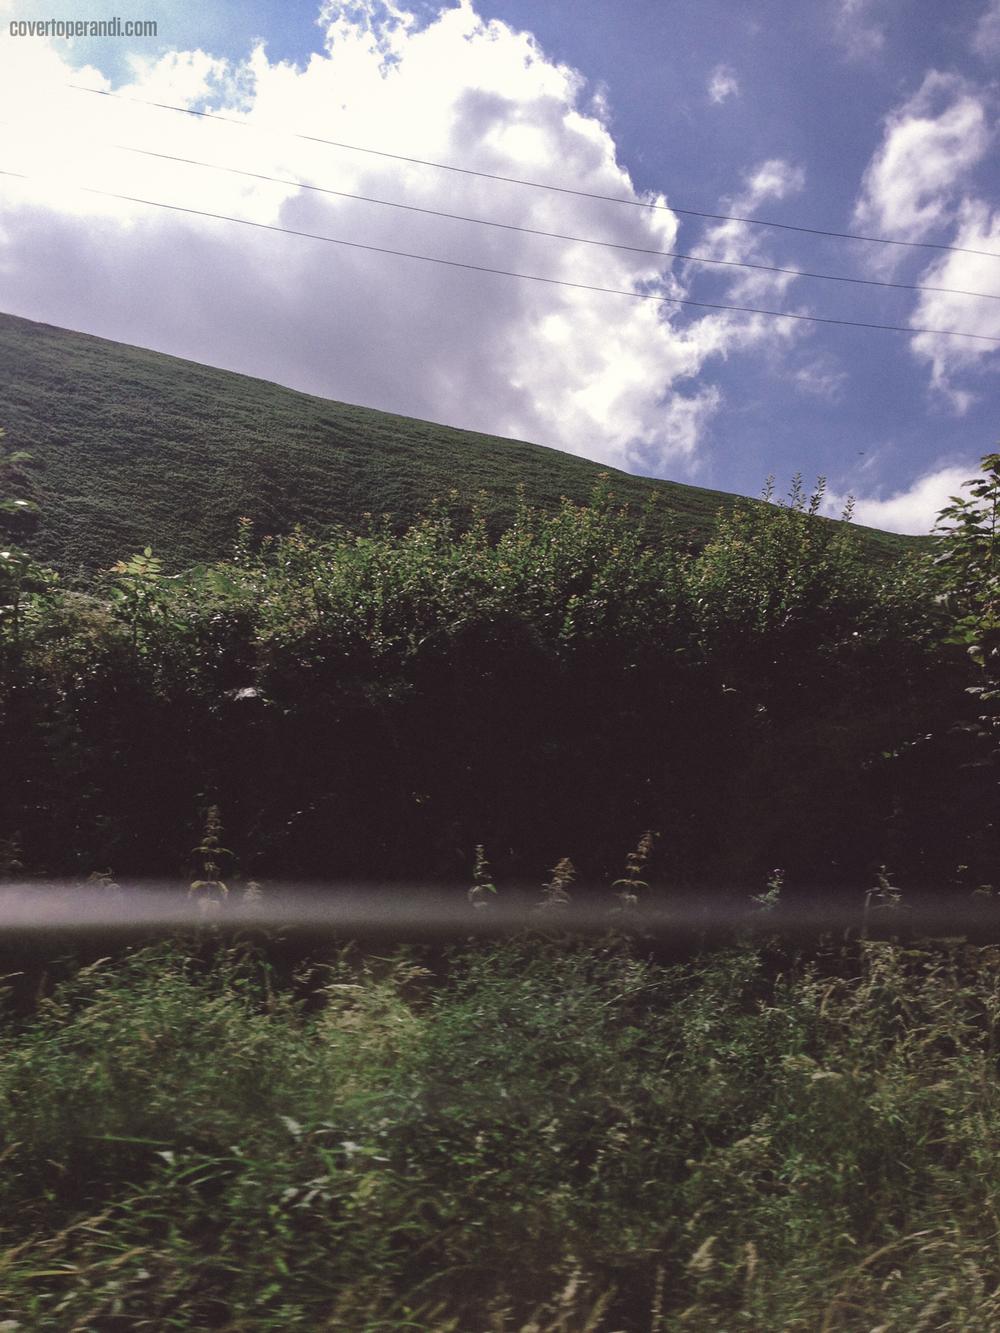 Covert Operandi - 2014 Wales-5.jpg